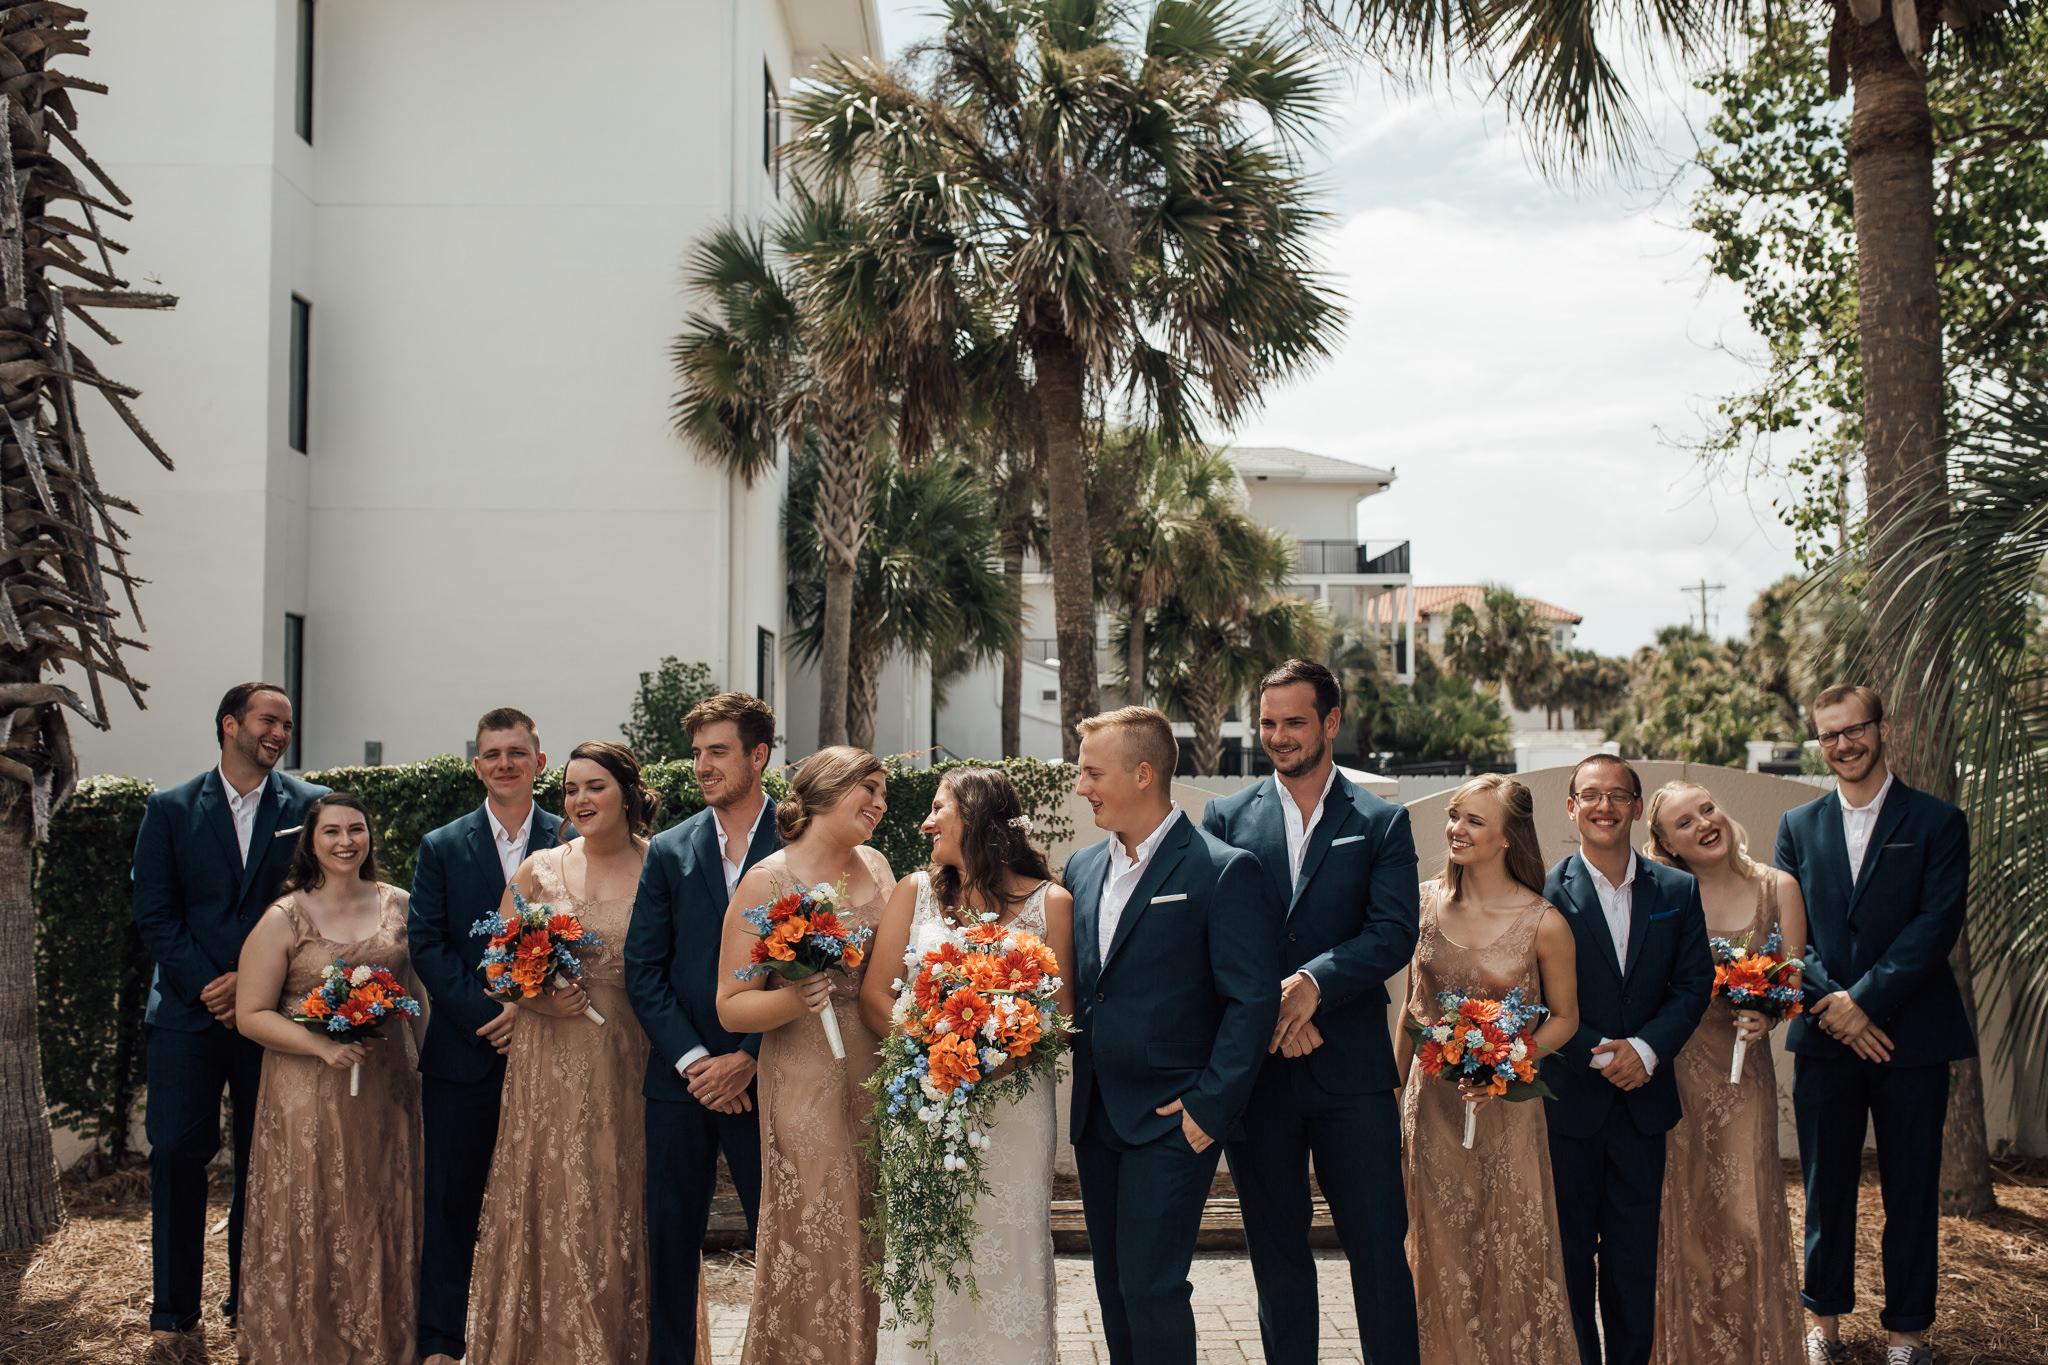 cassie-cook-photography-santa-rosa-beach-wedding-farrar-wedding-28.jpg